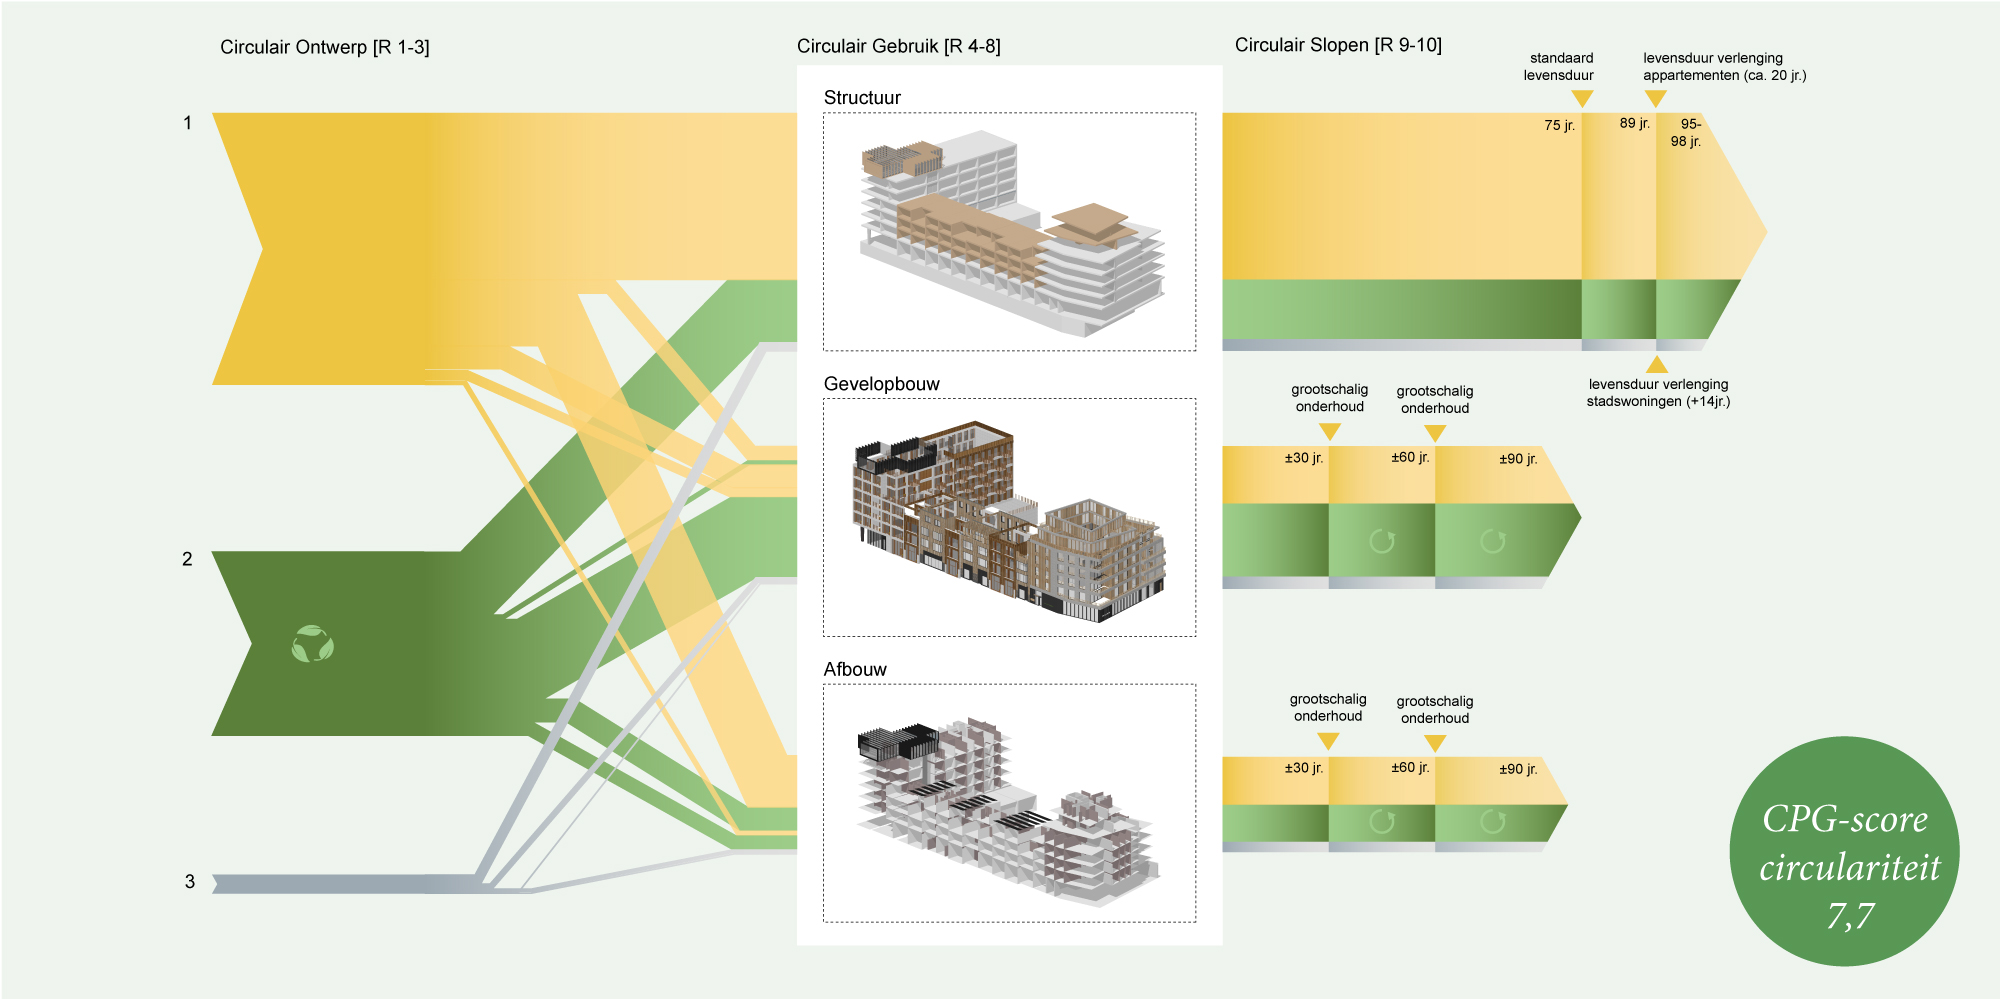 circulair-materiaal-diagram-flexibel-architectuur